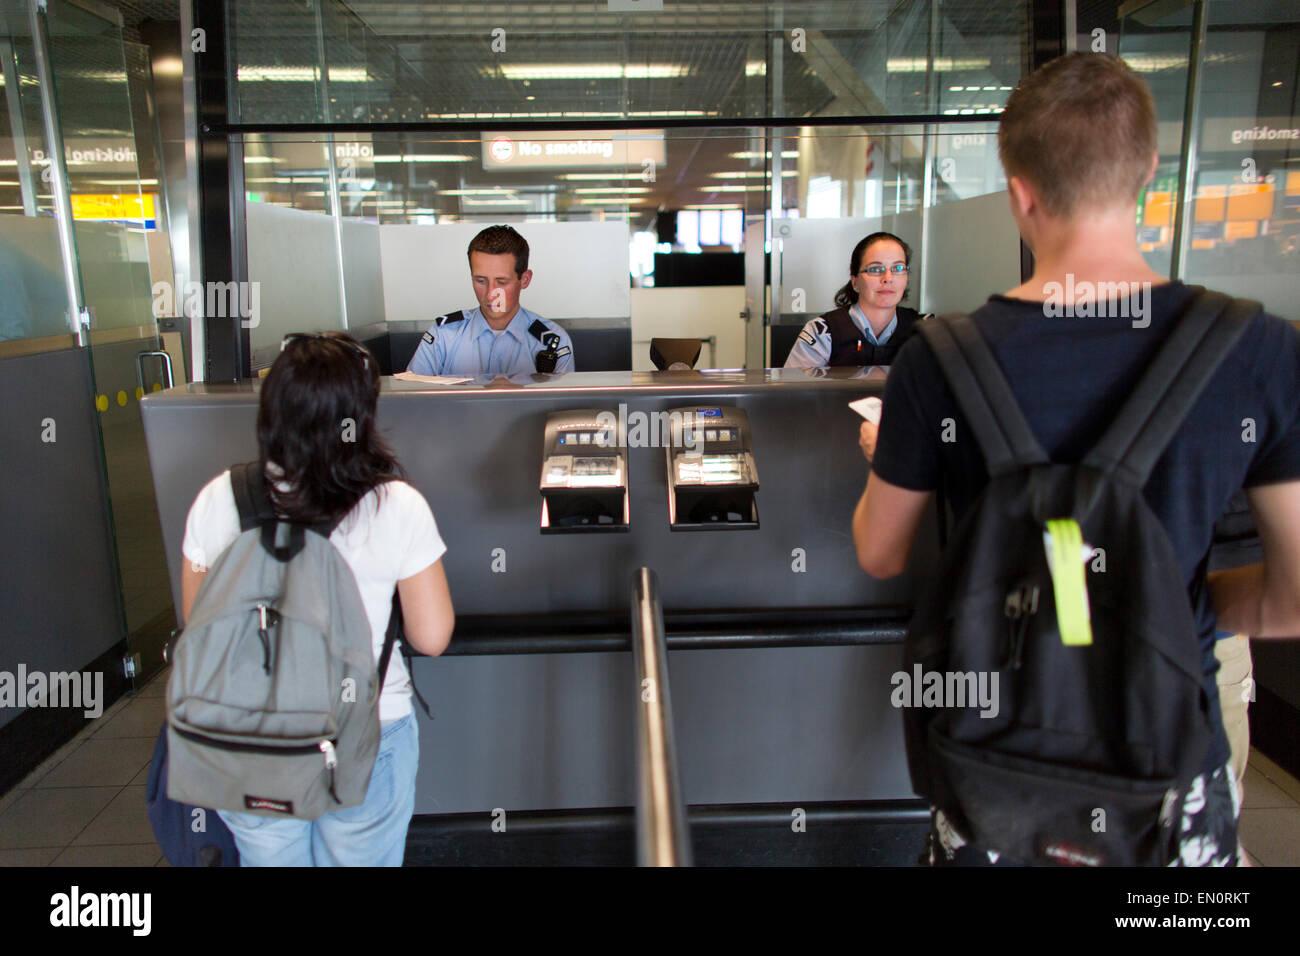 passport control at schiphol airport - Stock Image